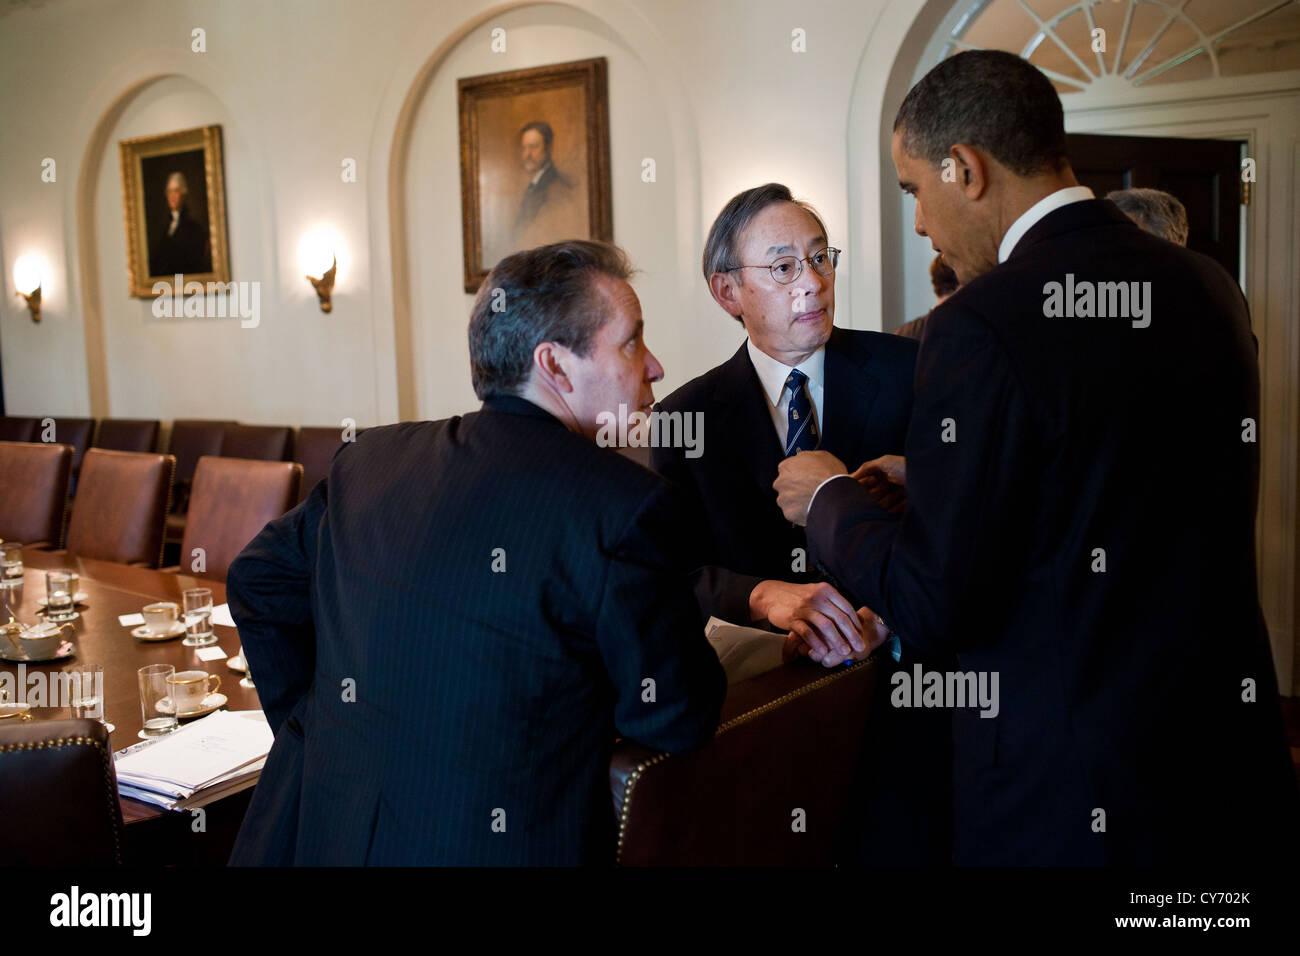 US President Barack Obama speaks with National Economic Council Director Gene Sperling and Energy Secretary Steven - Stock Image